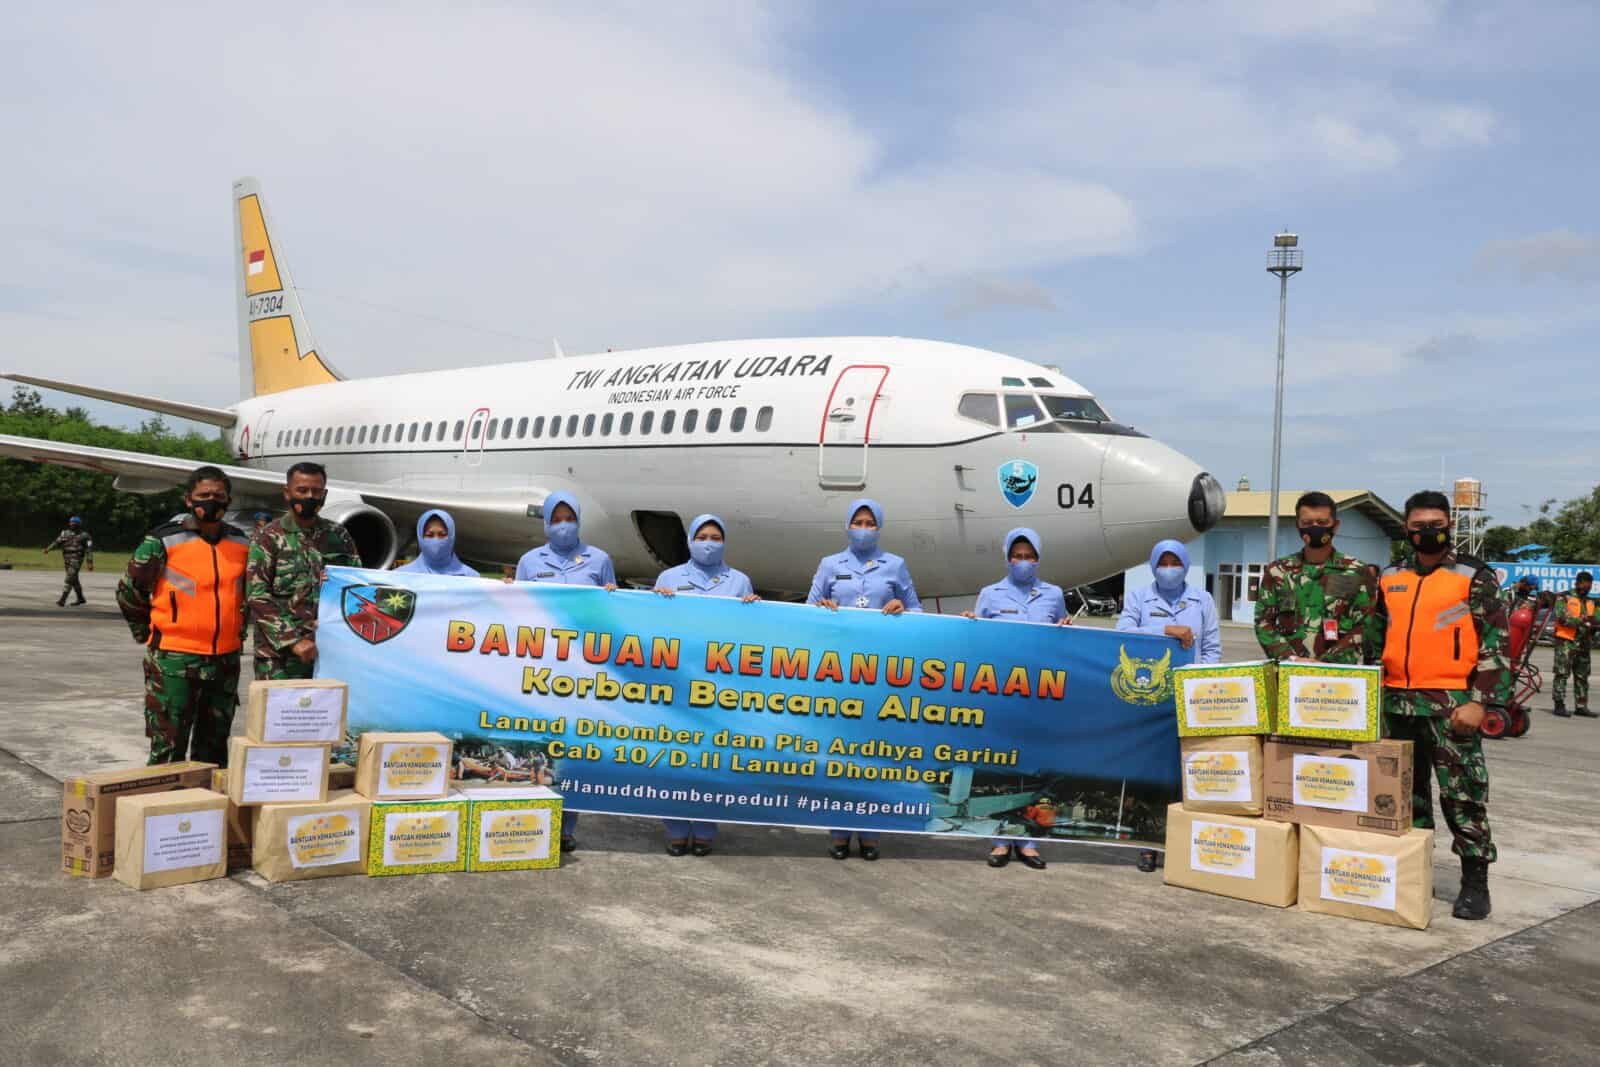 Peduli Korban Gempa Sulawesi Barat, PIA AG Cabang 10/ D.II Lanud Dhomber Kirim Bantuan.